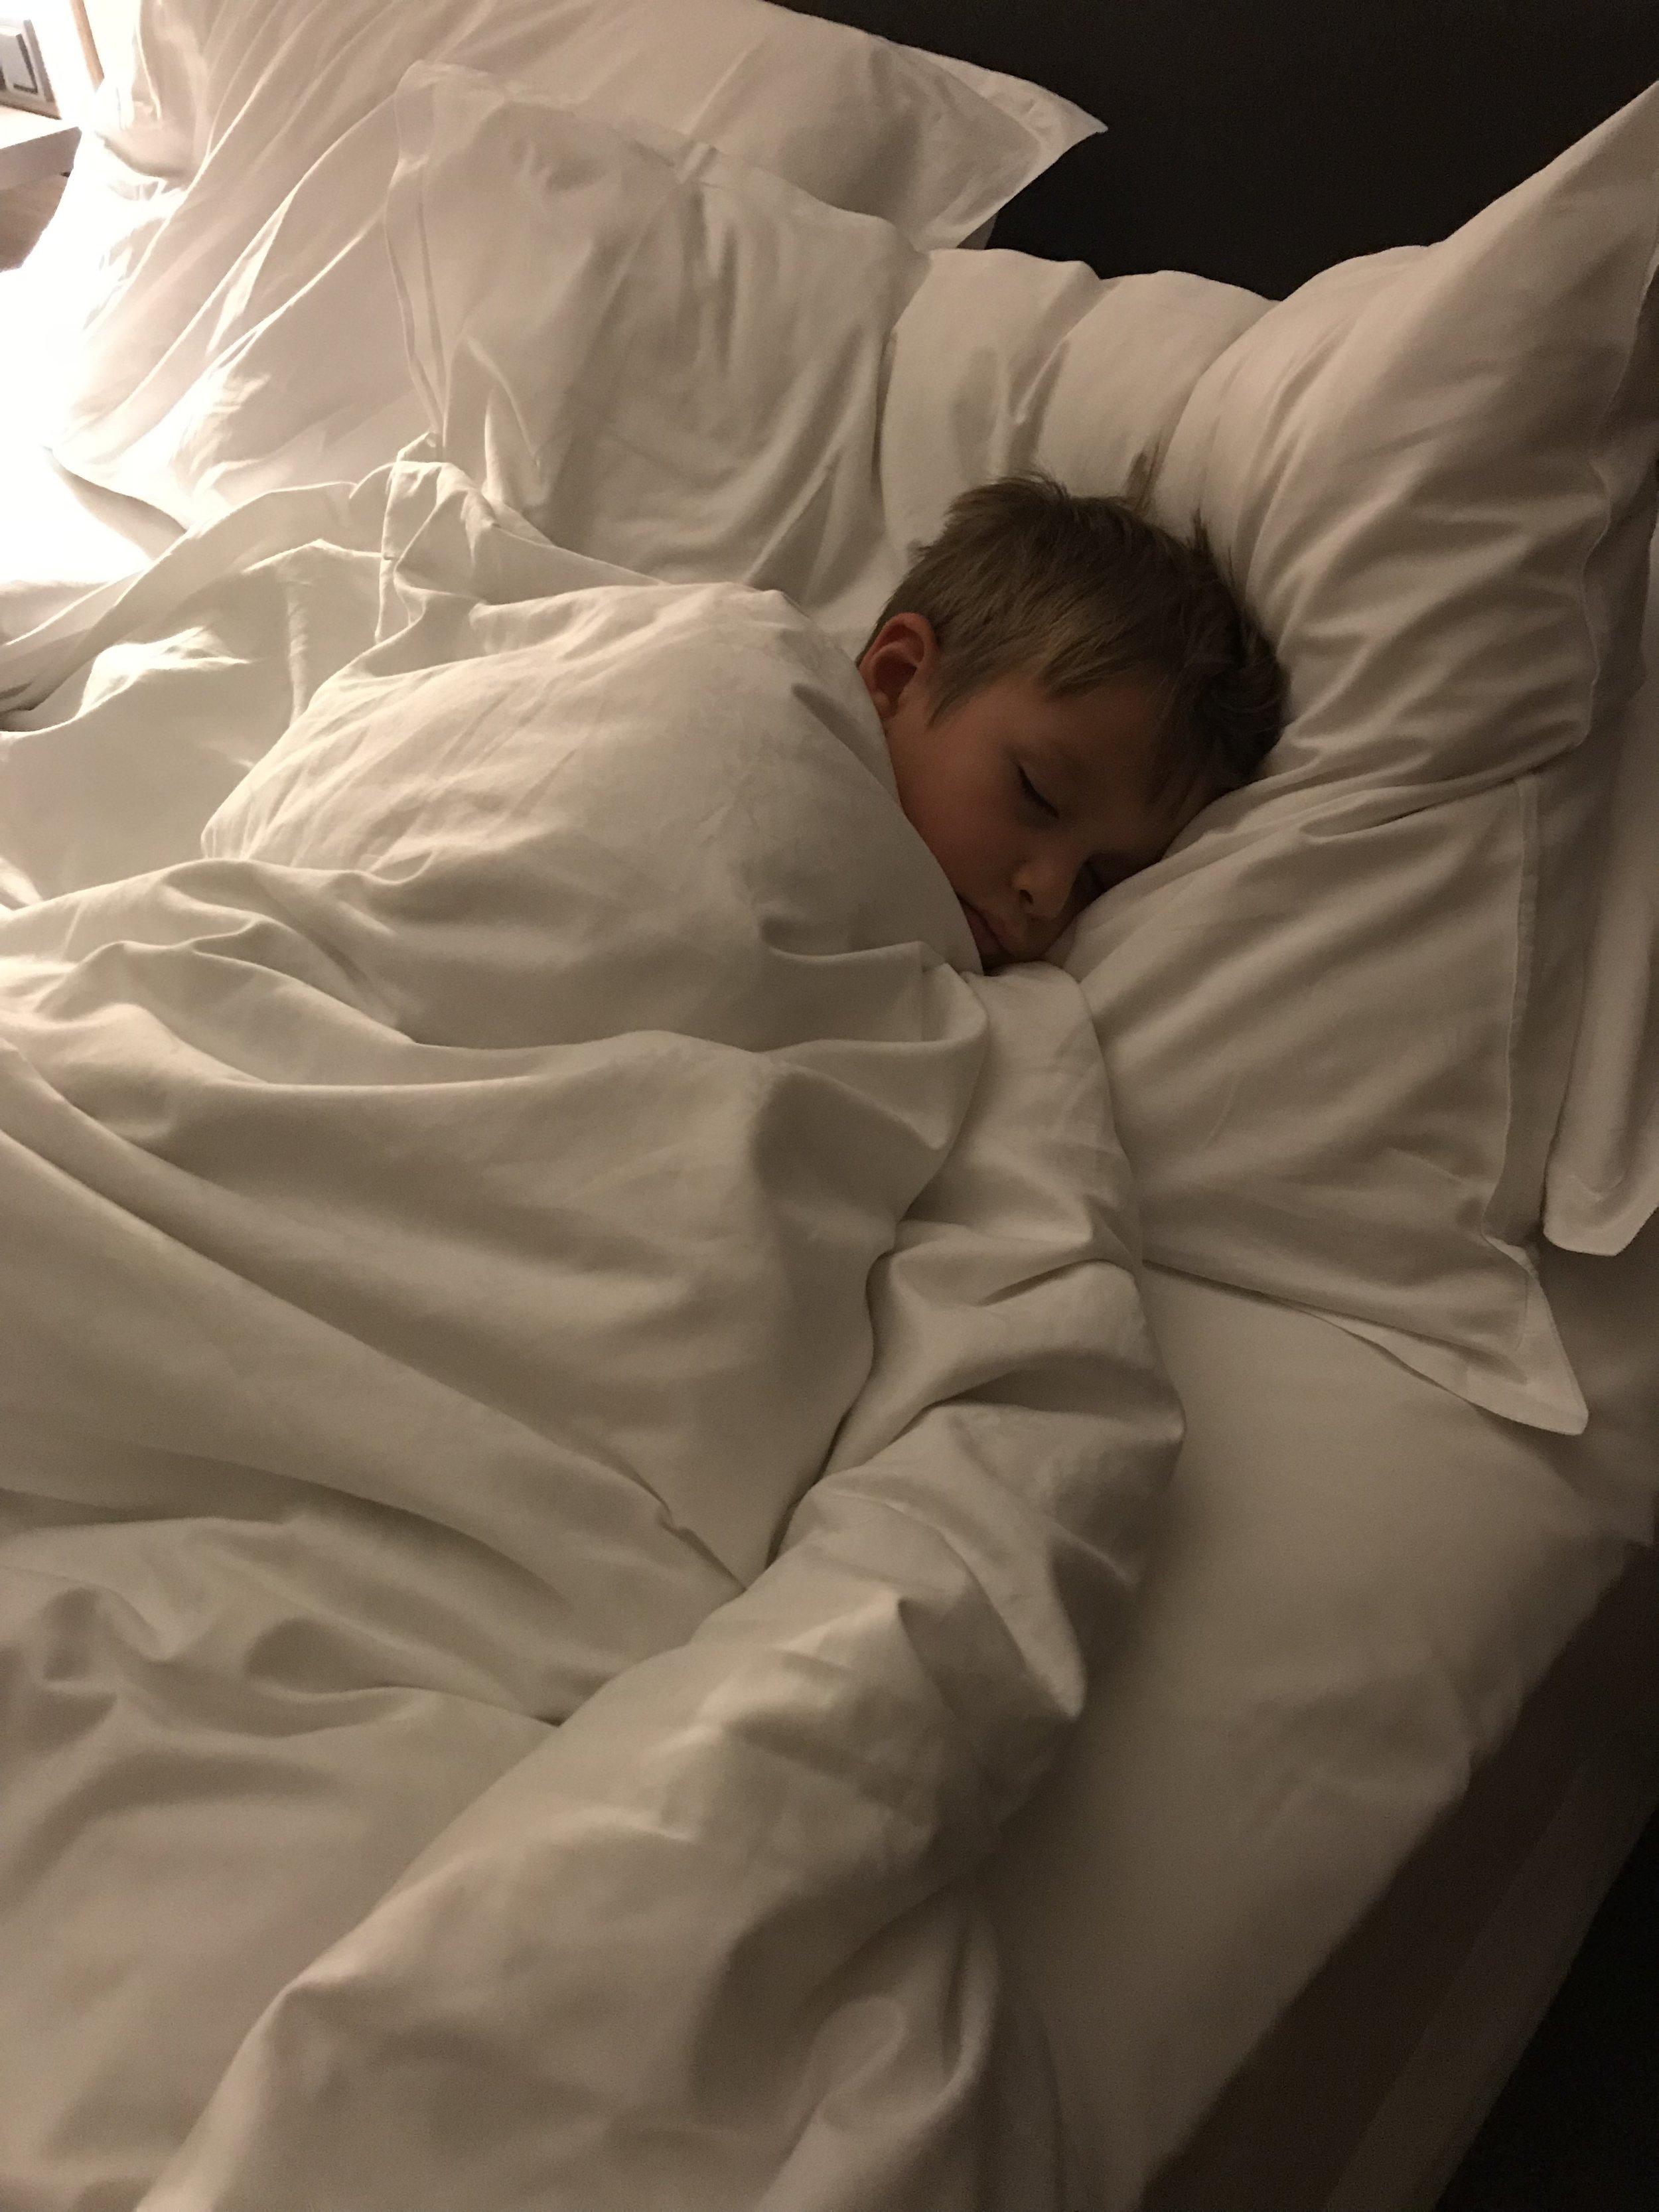 Soft pillows and crisp sheets. 📷 Rikke Hjuler